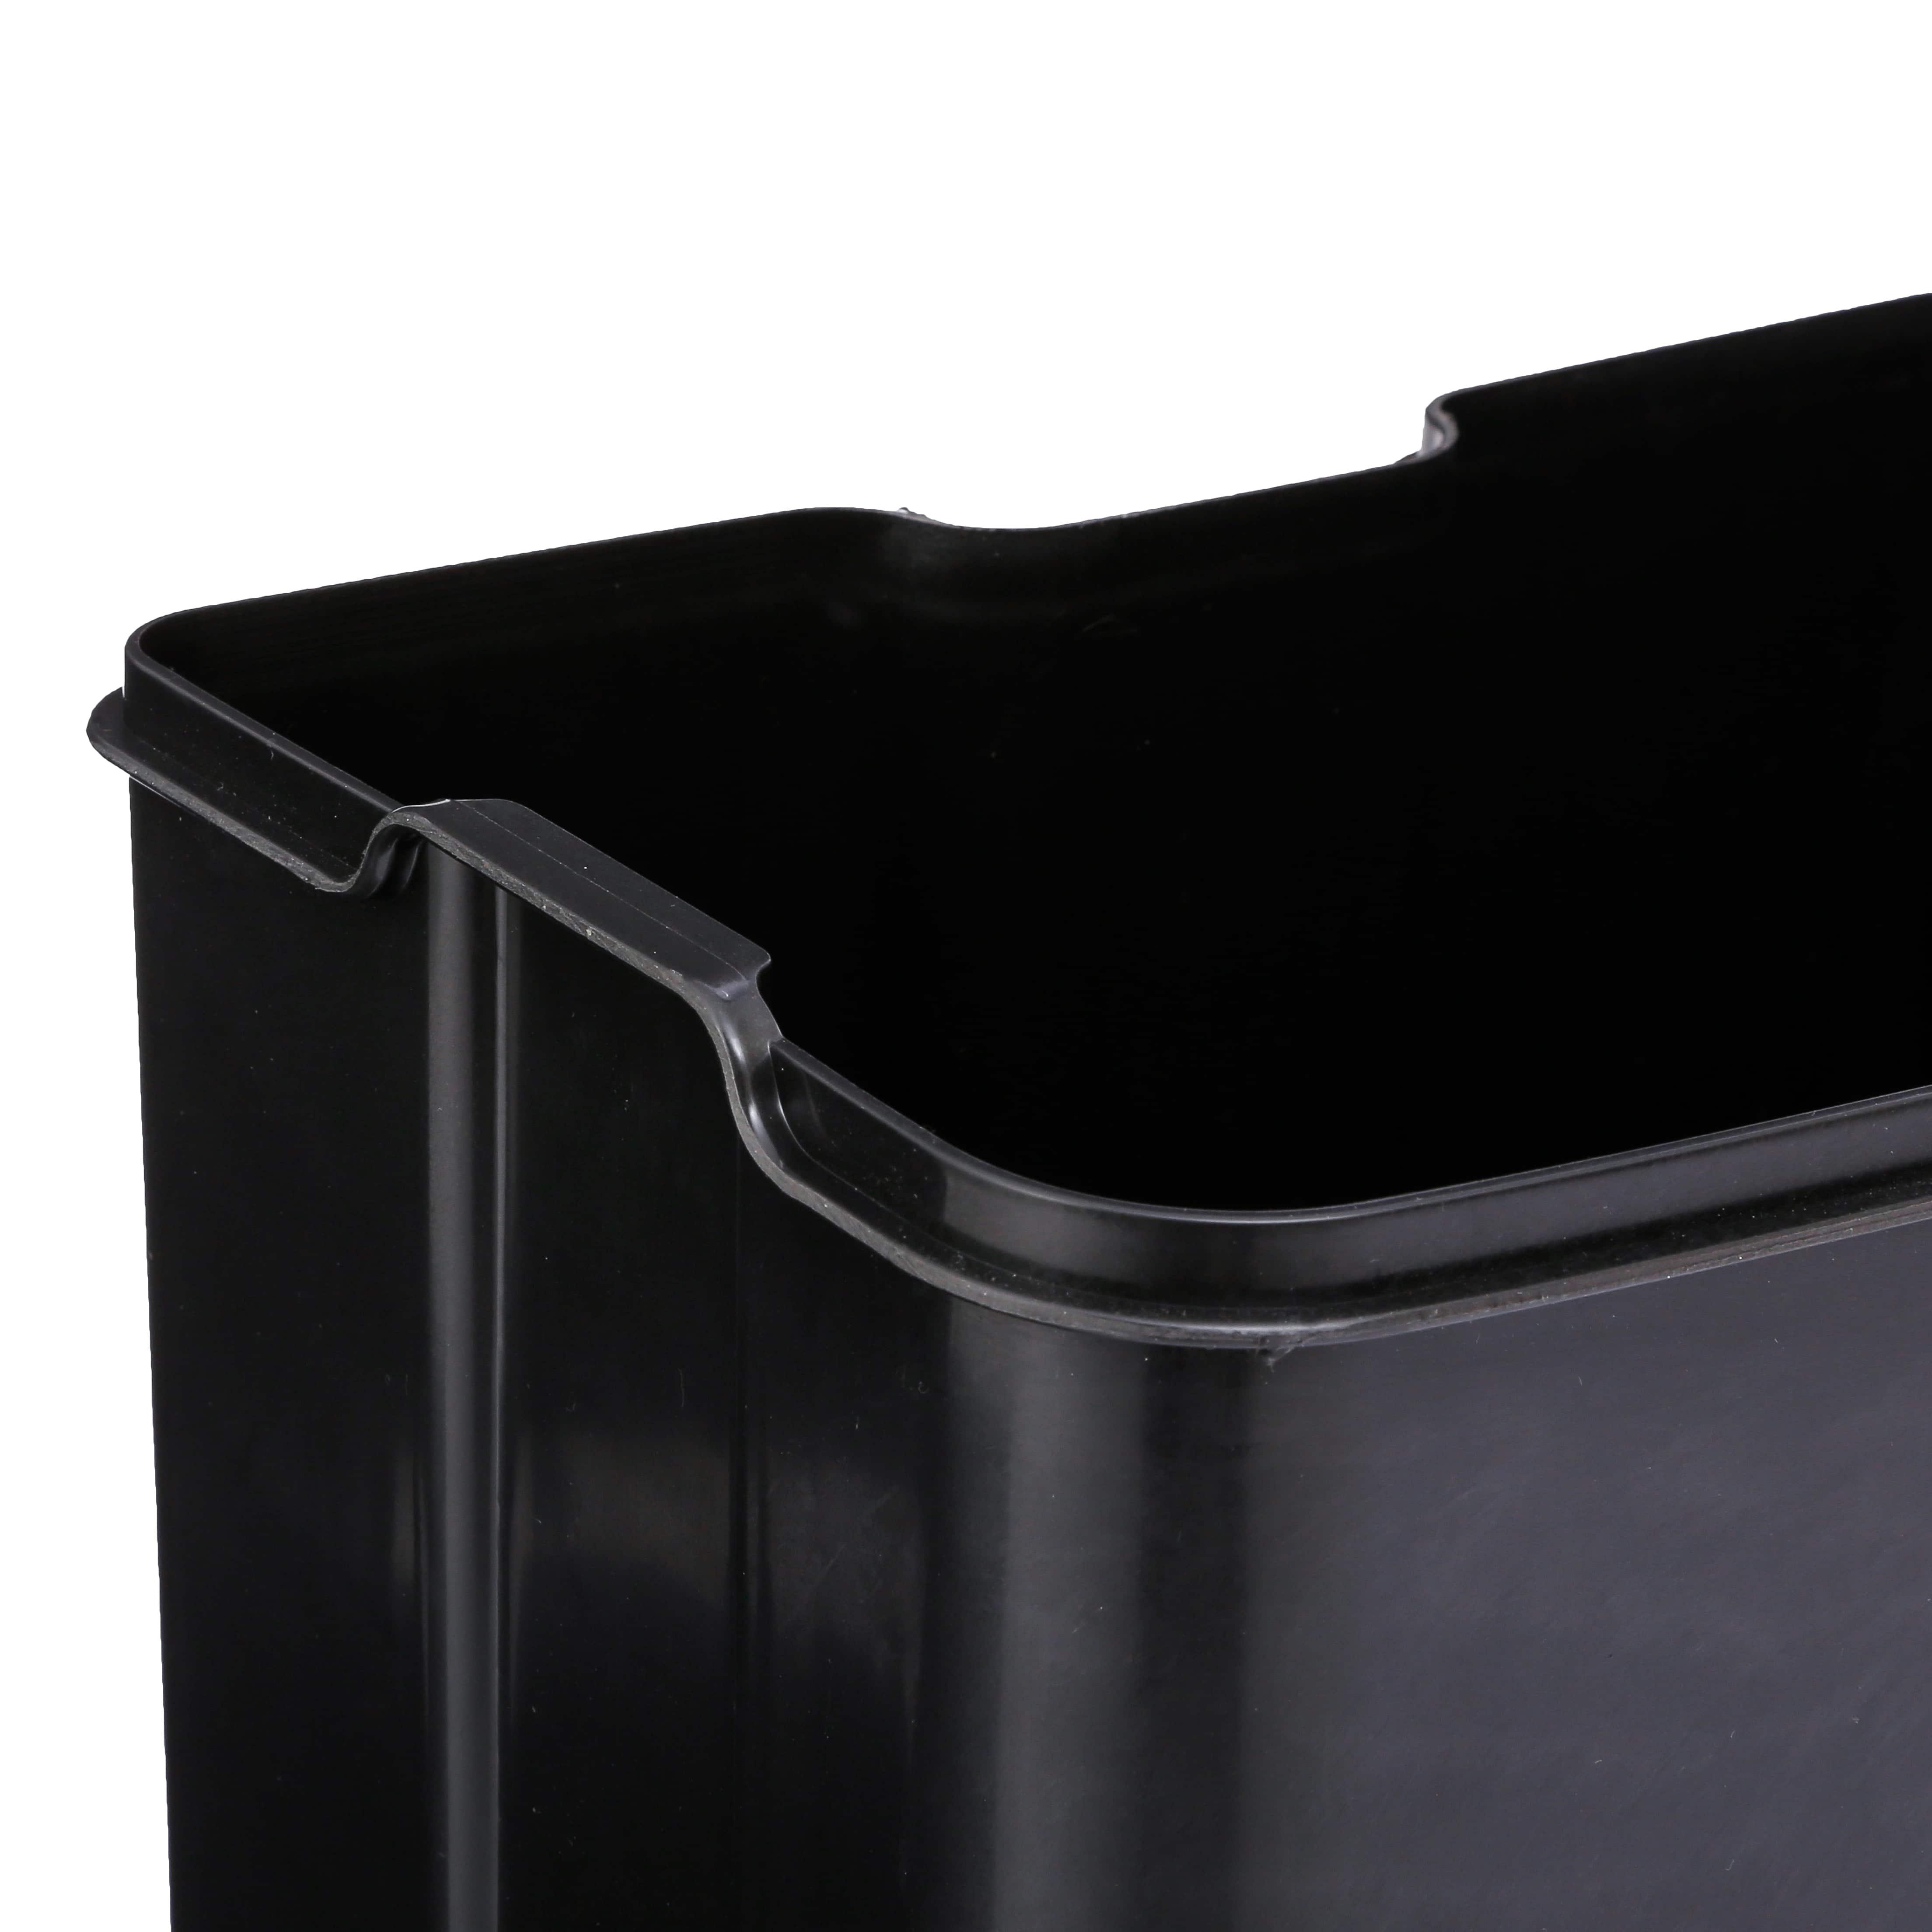 4goodz pedaalemmer 30 liter met uitneembare emmer 34x32x61cm - Blauw